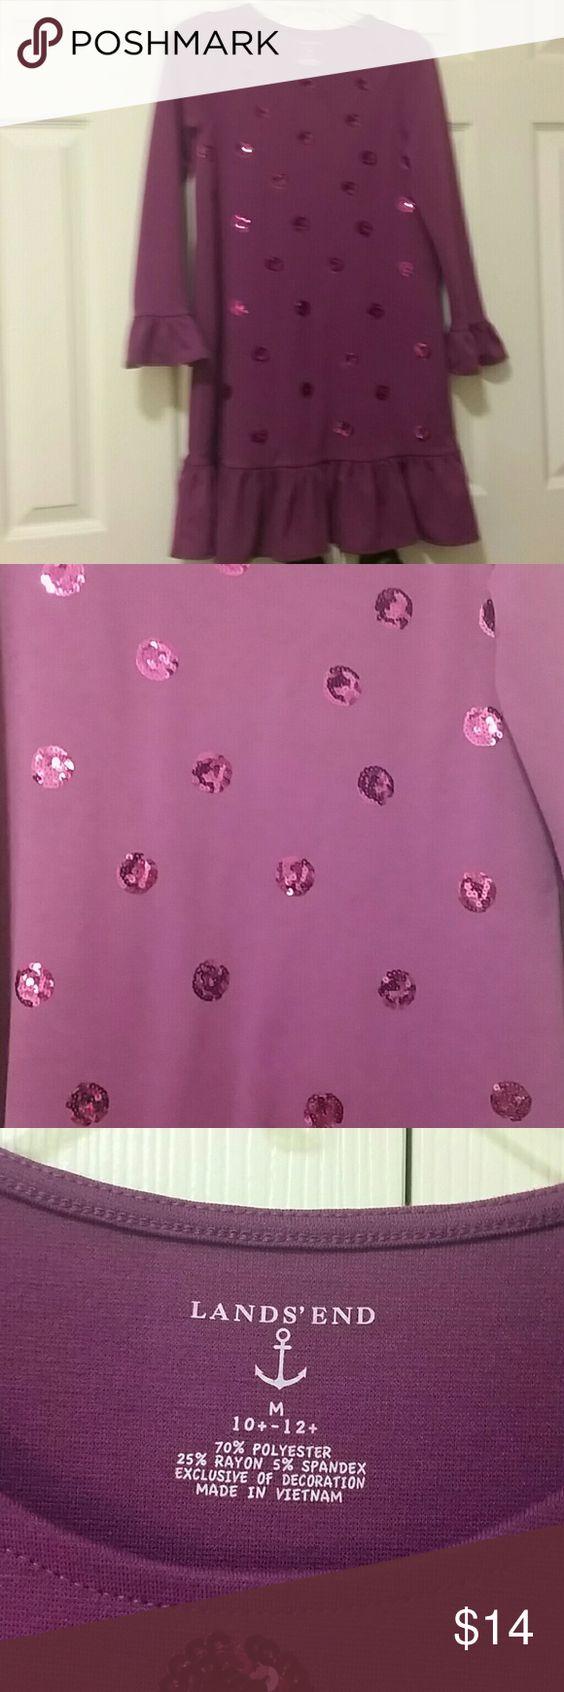 Lands end raspberry sparkle dress Long sleeve ruffle bottom ruffle wrist sequins sparkle dress Lands' End Dresses Formal